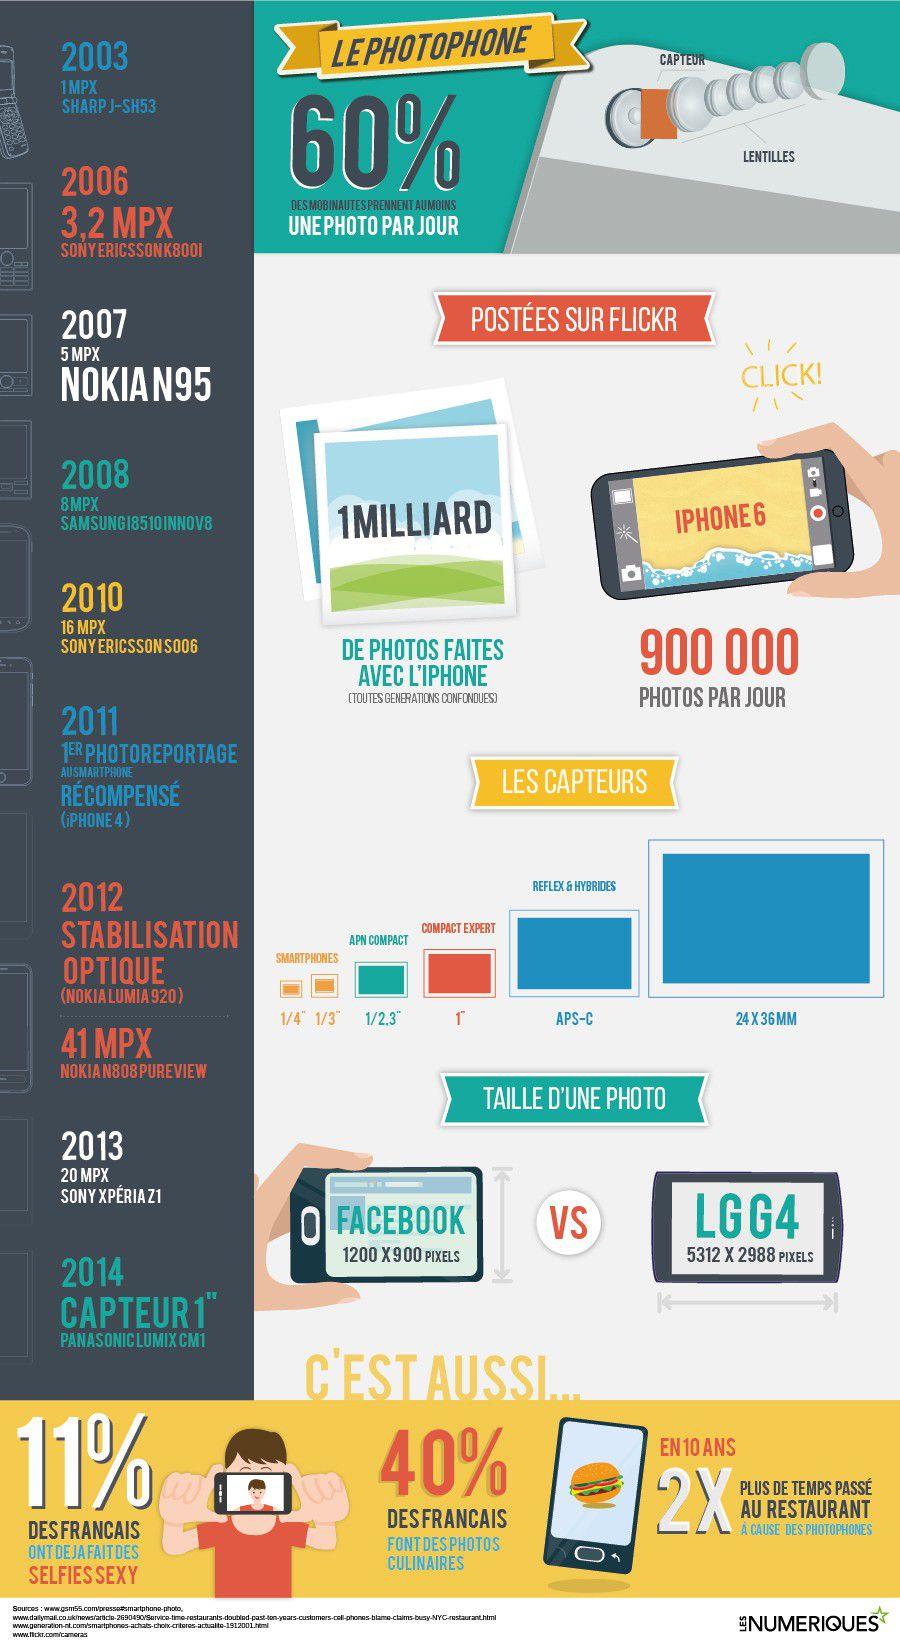 illus-smartphone-01.jpg